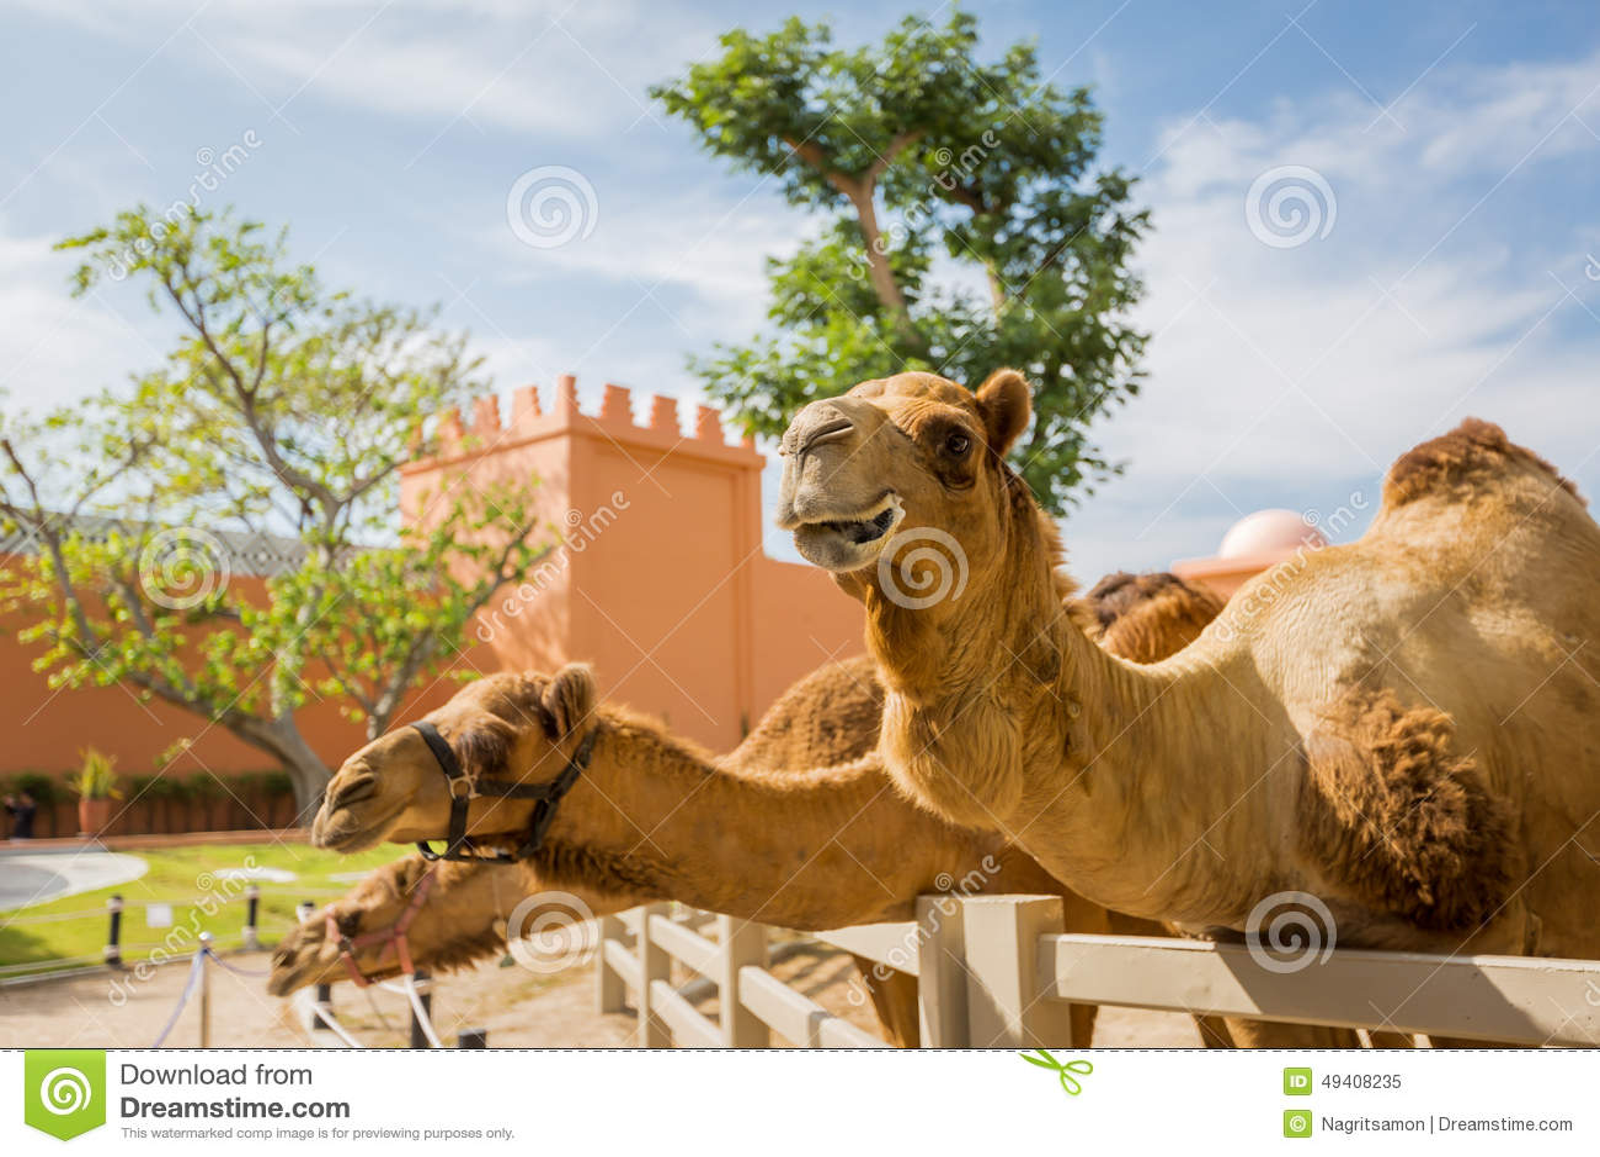 Download Kamel stockbild. Bild von transport, sattel, nave, säugetier - 49408235